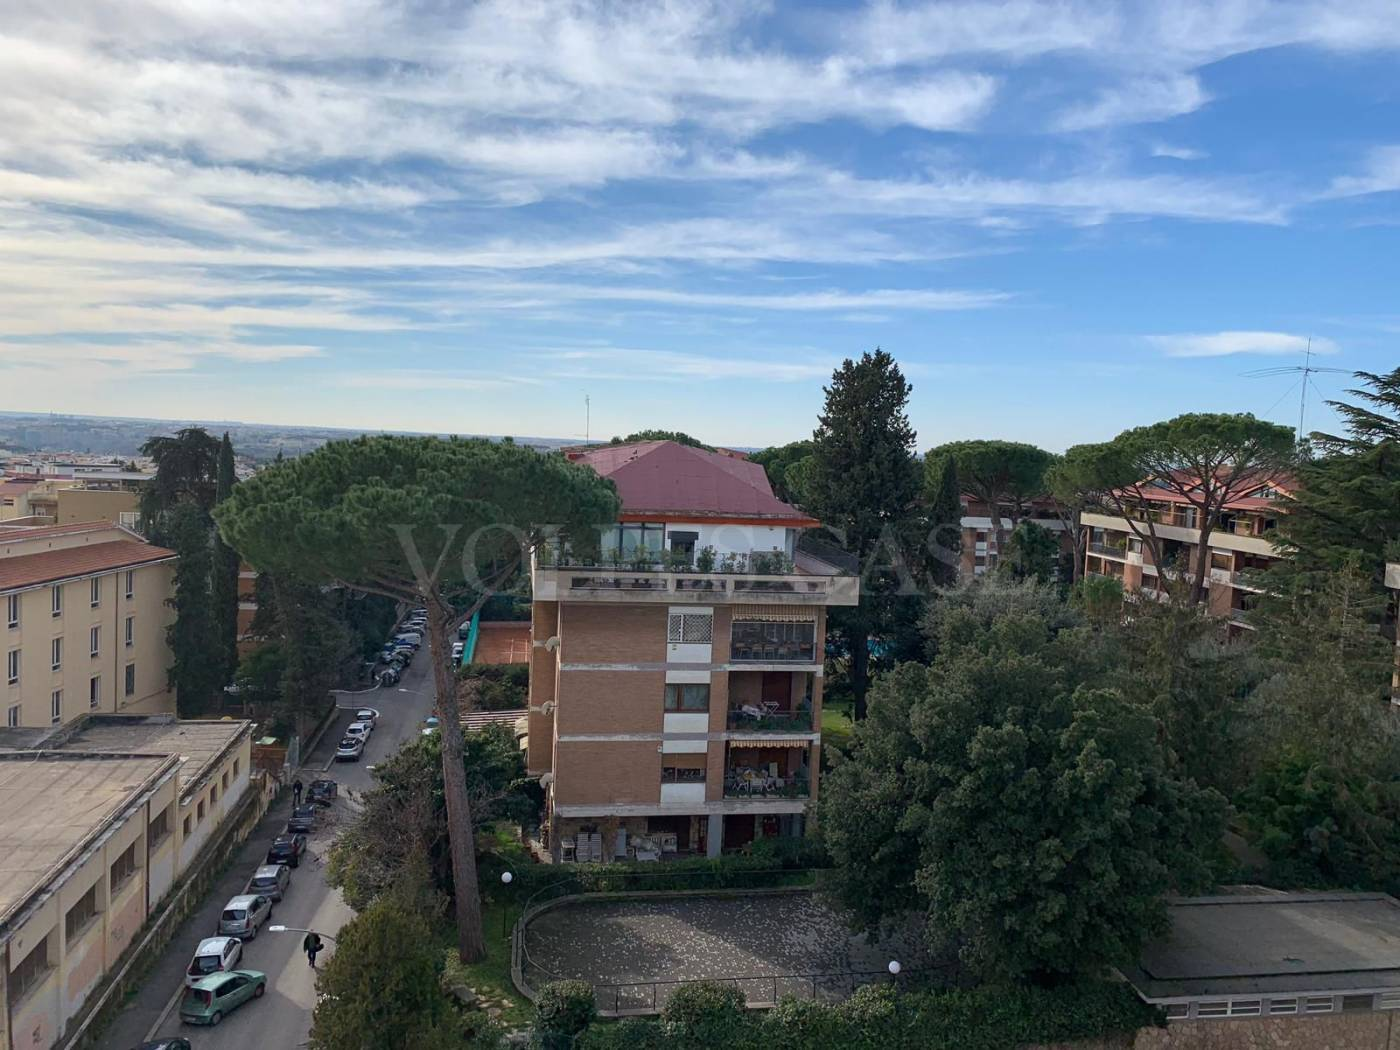 Attico ROMA vendita  Balduina  Volpes Case srl